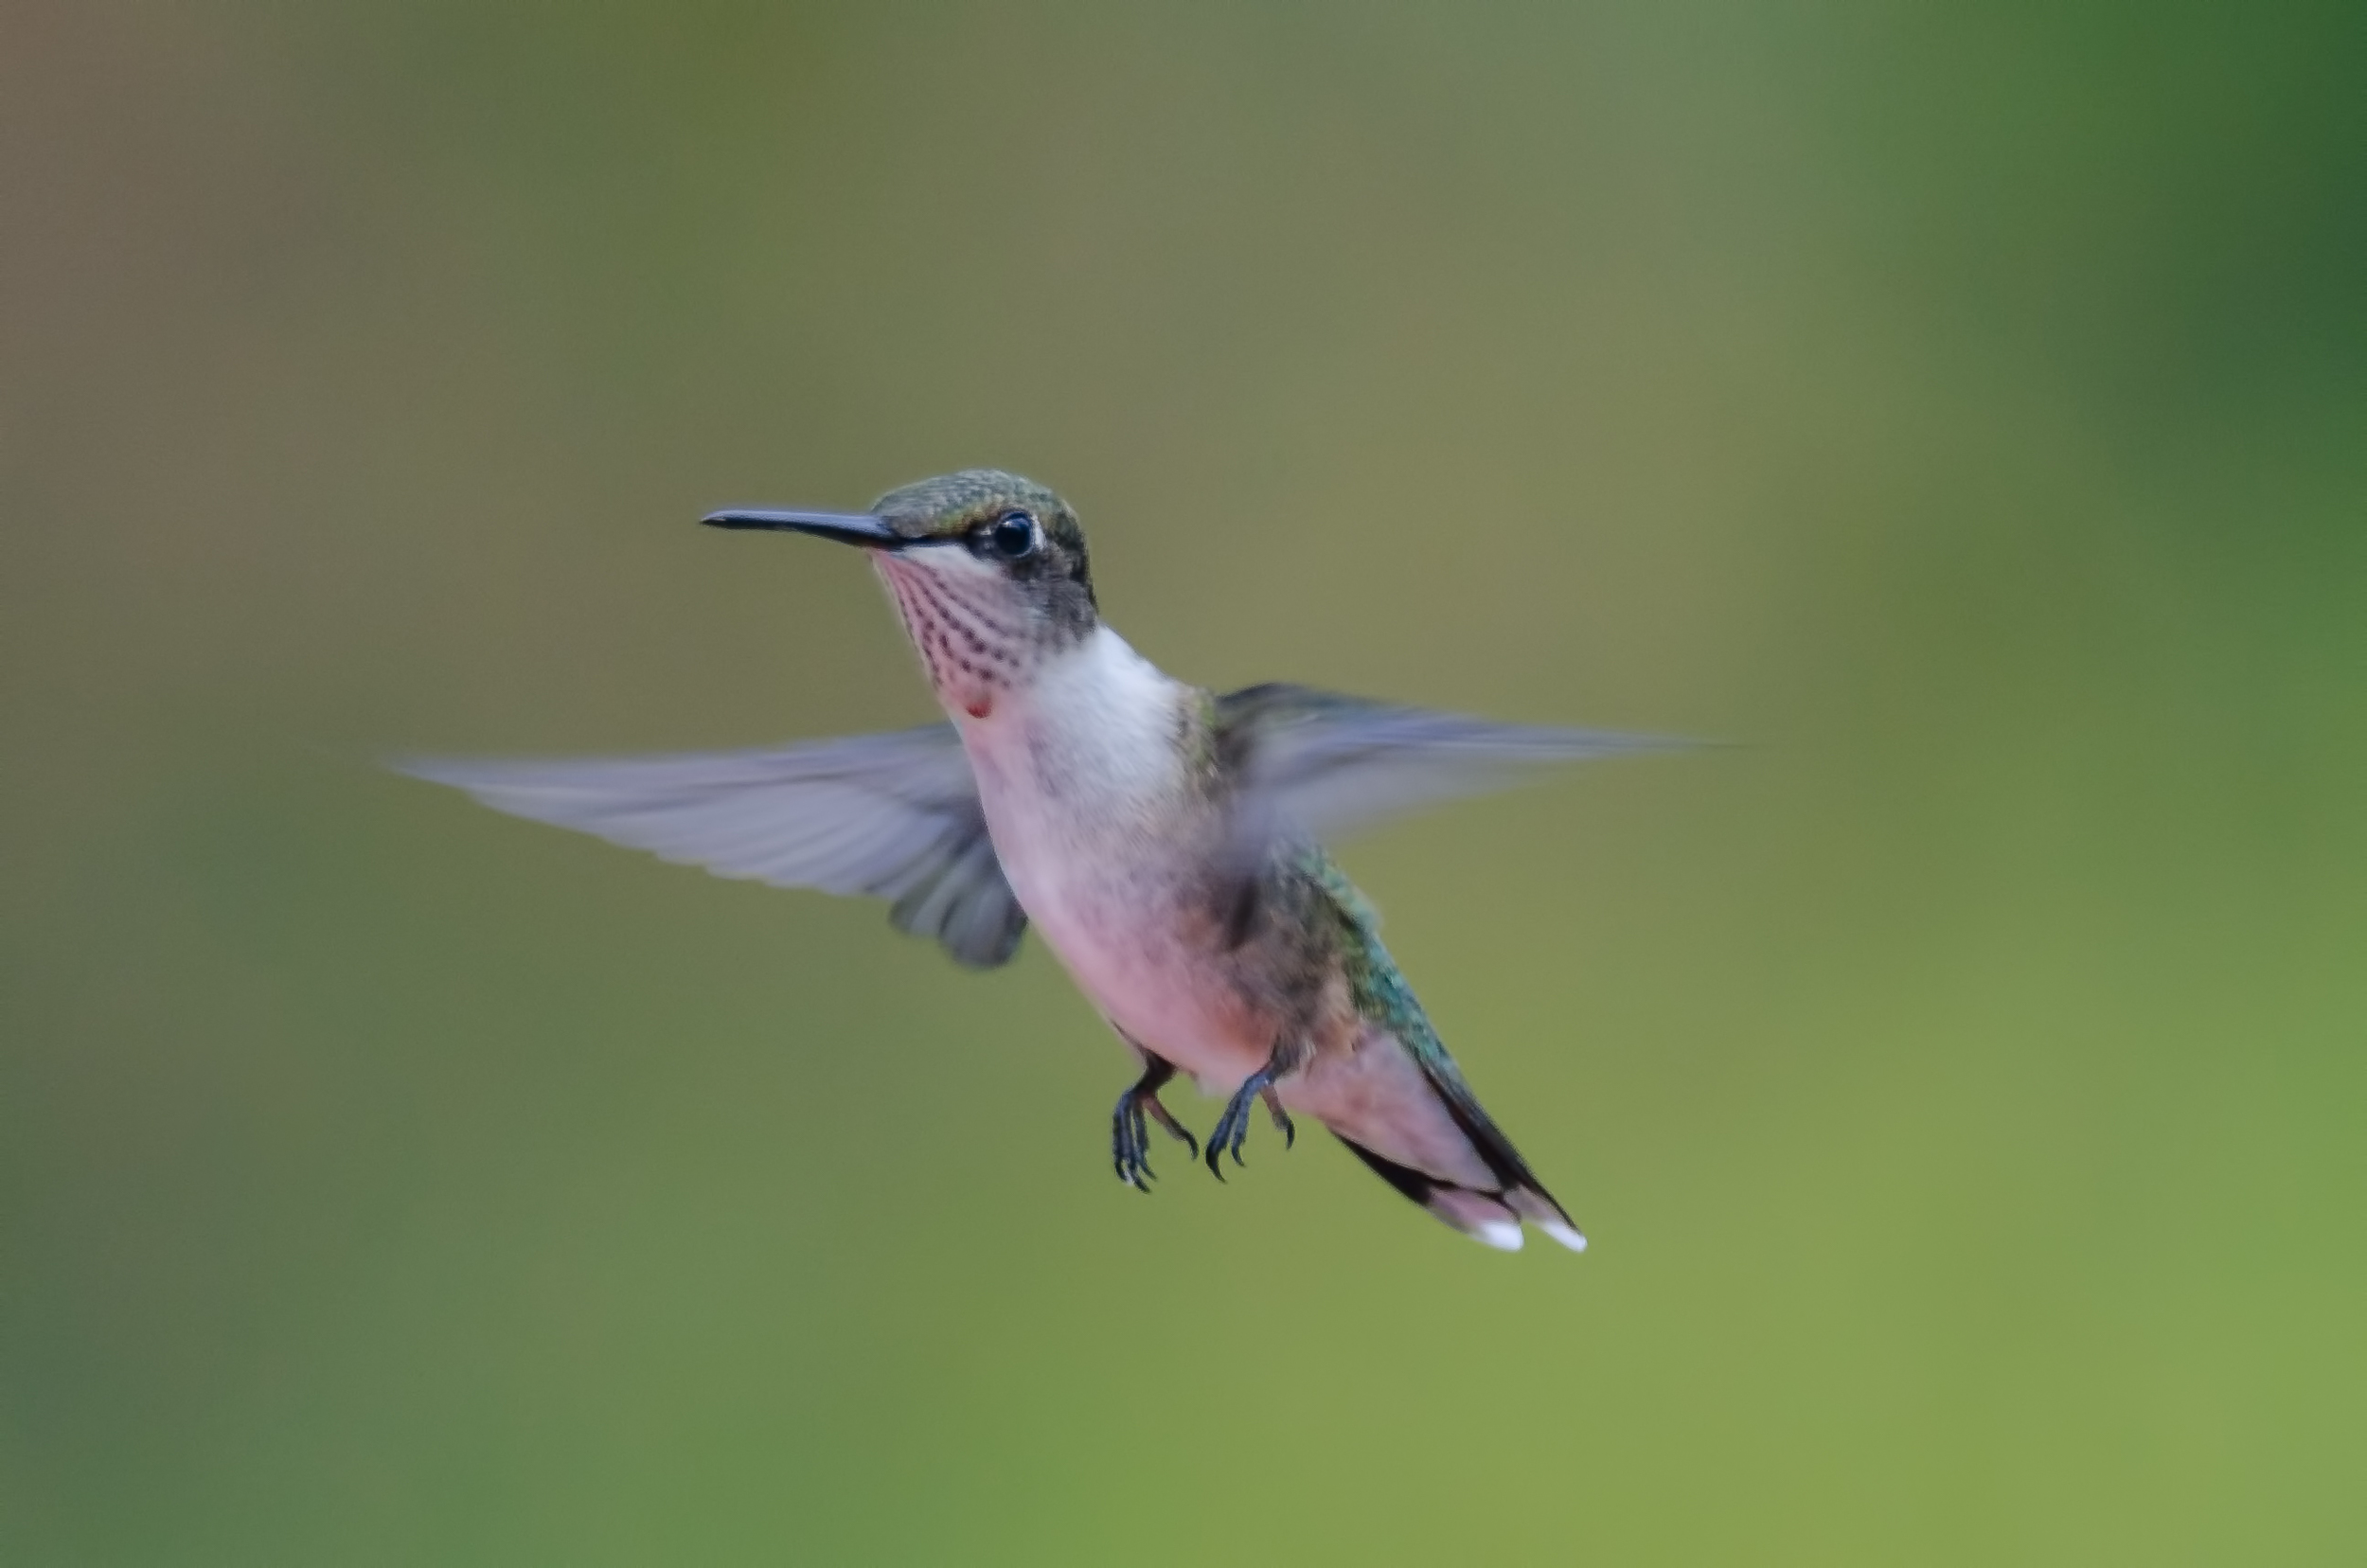 Ruby-Throated Hummingbird  Nikon D7000 ISO 400 500mm f/8.0 1/500 sec.